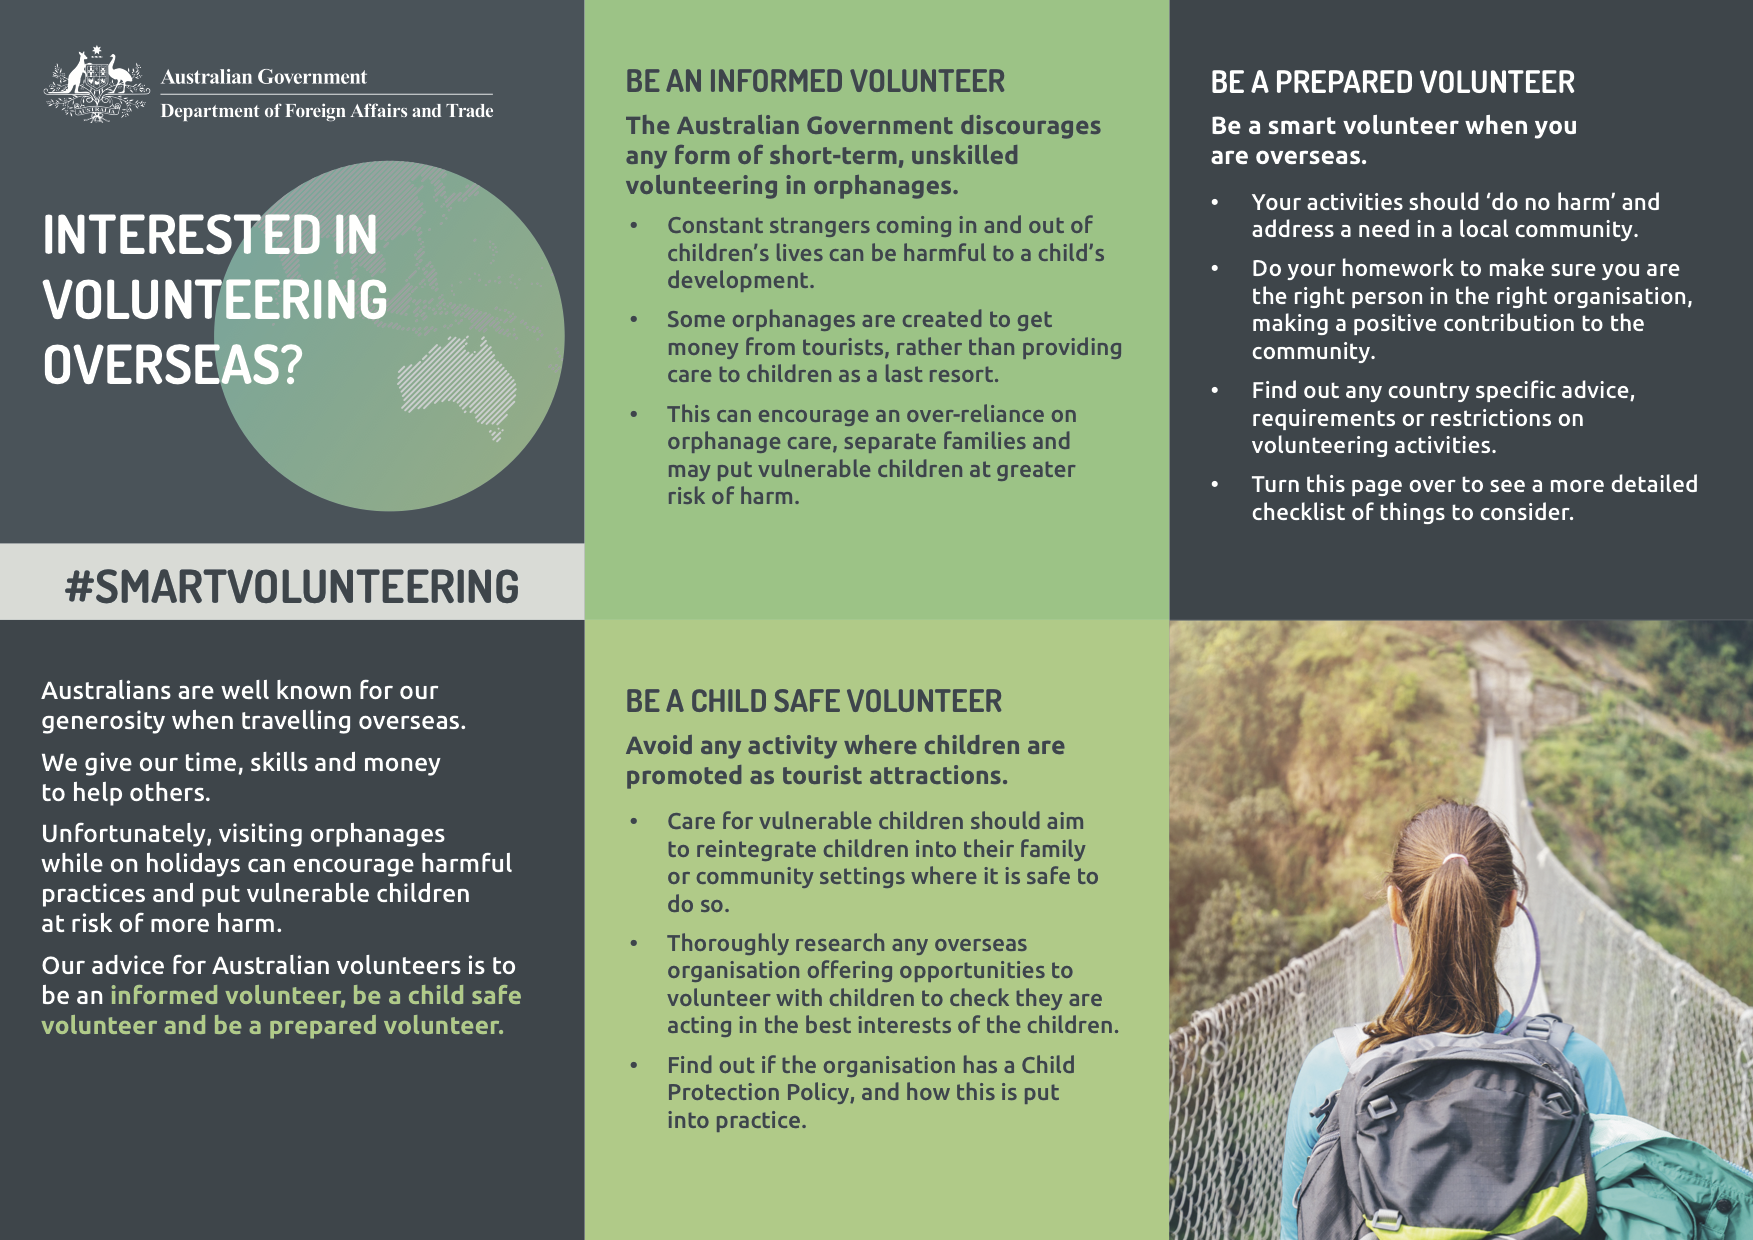 Smart_volunteering_brochure_FINAL_web_version.png